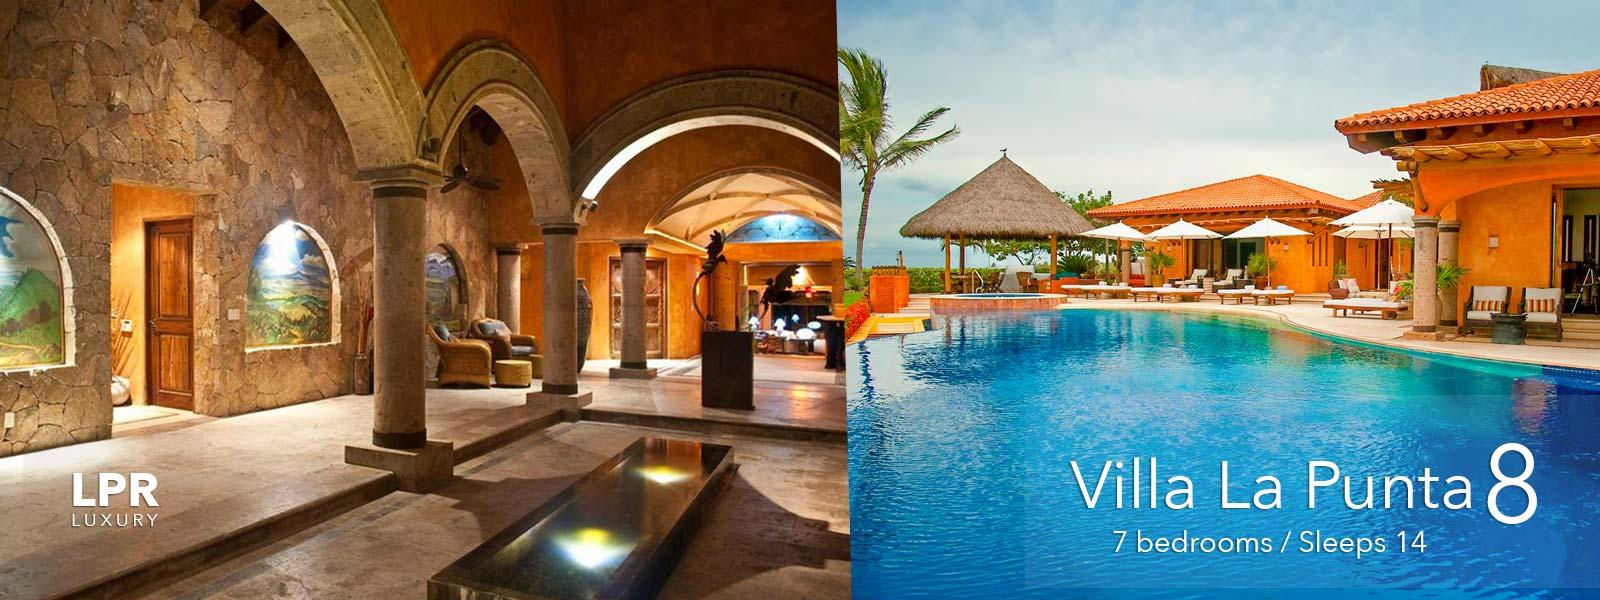 Villa la Punta 8 - La Punta Estate - Punta Mita Resort - Riviera Nayarit - Mexico